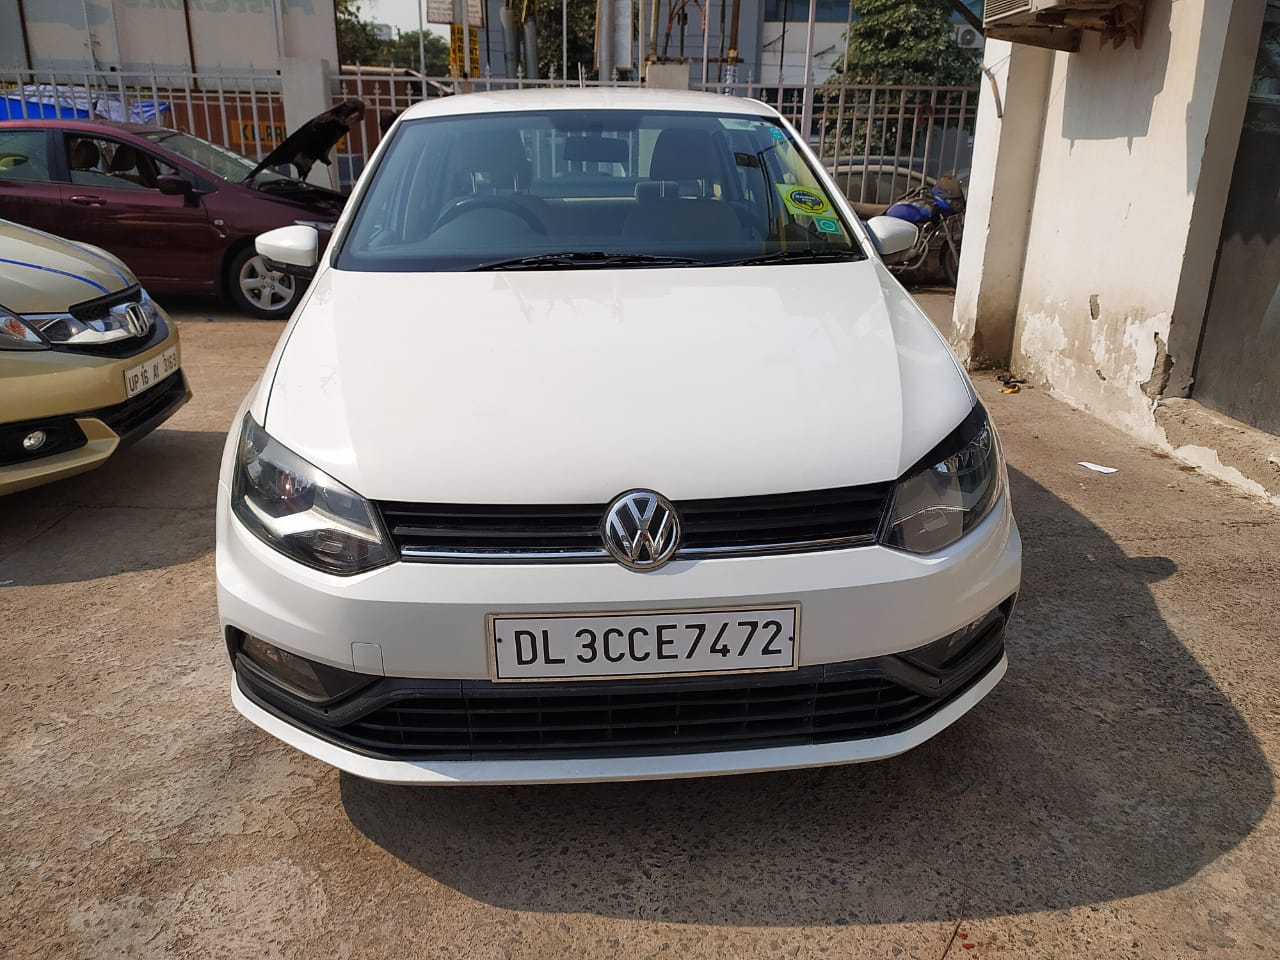 2016 Used Volkswagen Ameo 1.2 MPI ANNIVERSARY EDITION